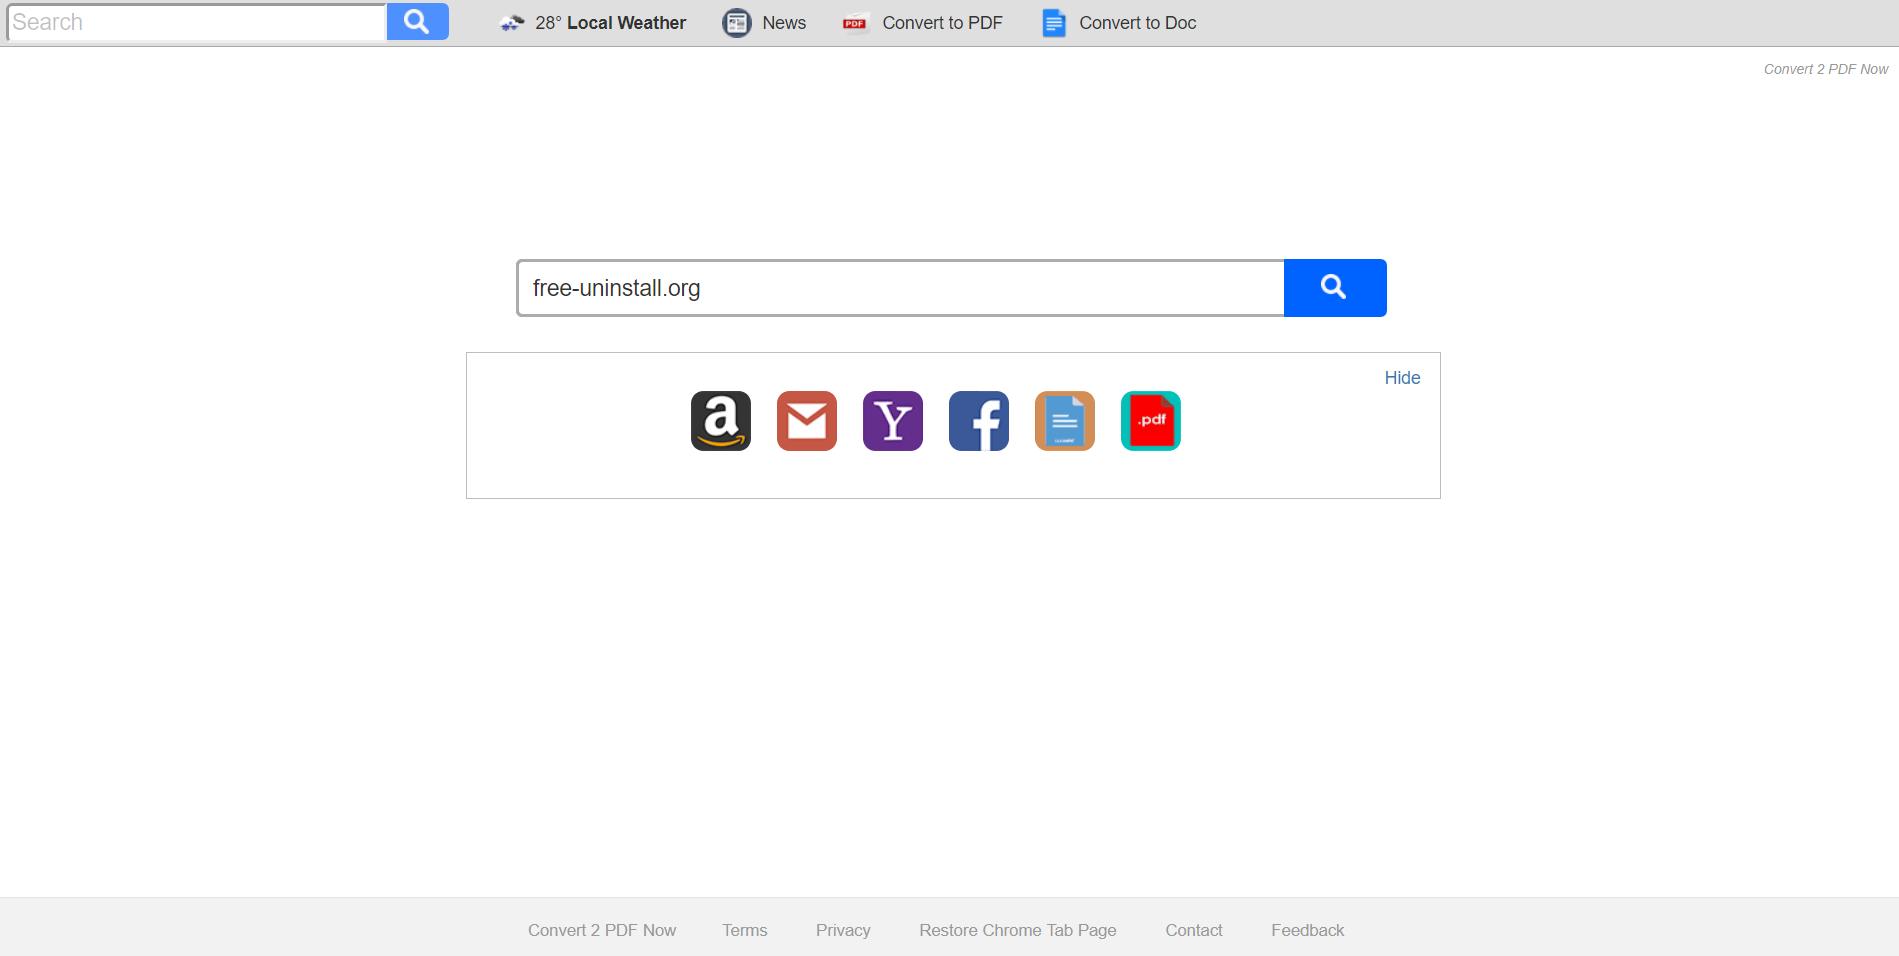 Search.hconvert2pdfnow.com Hijacker